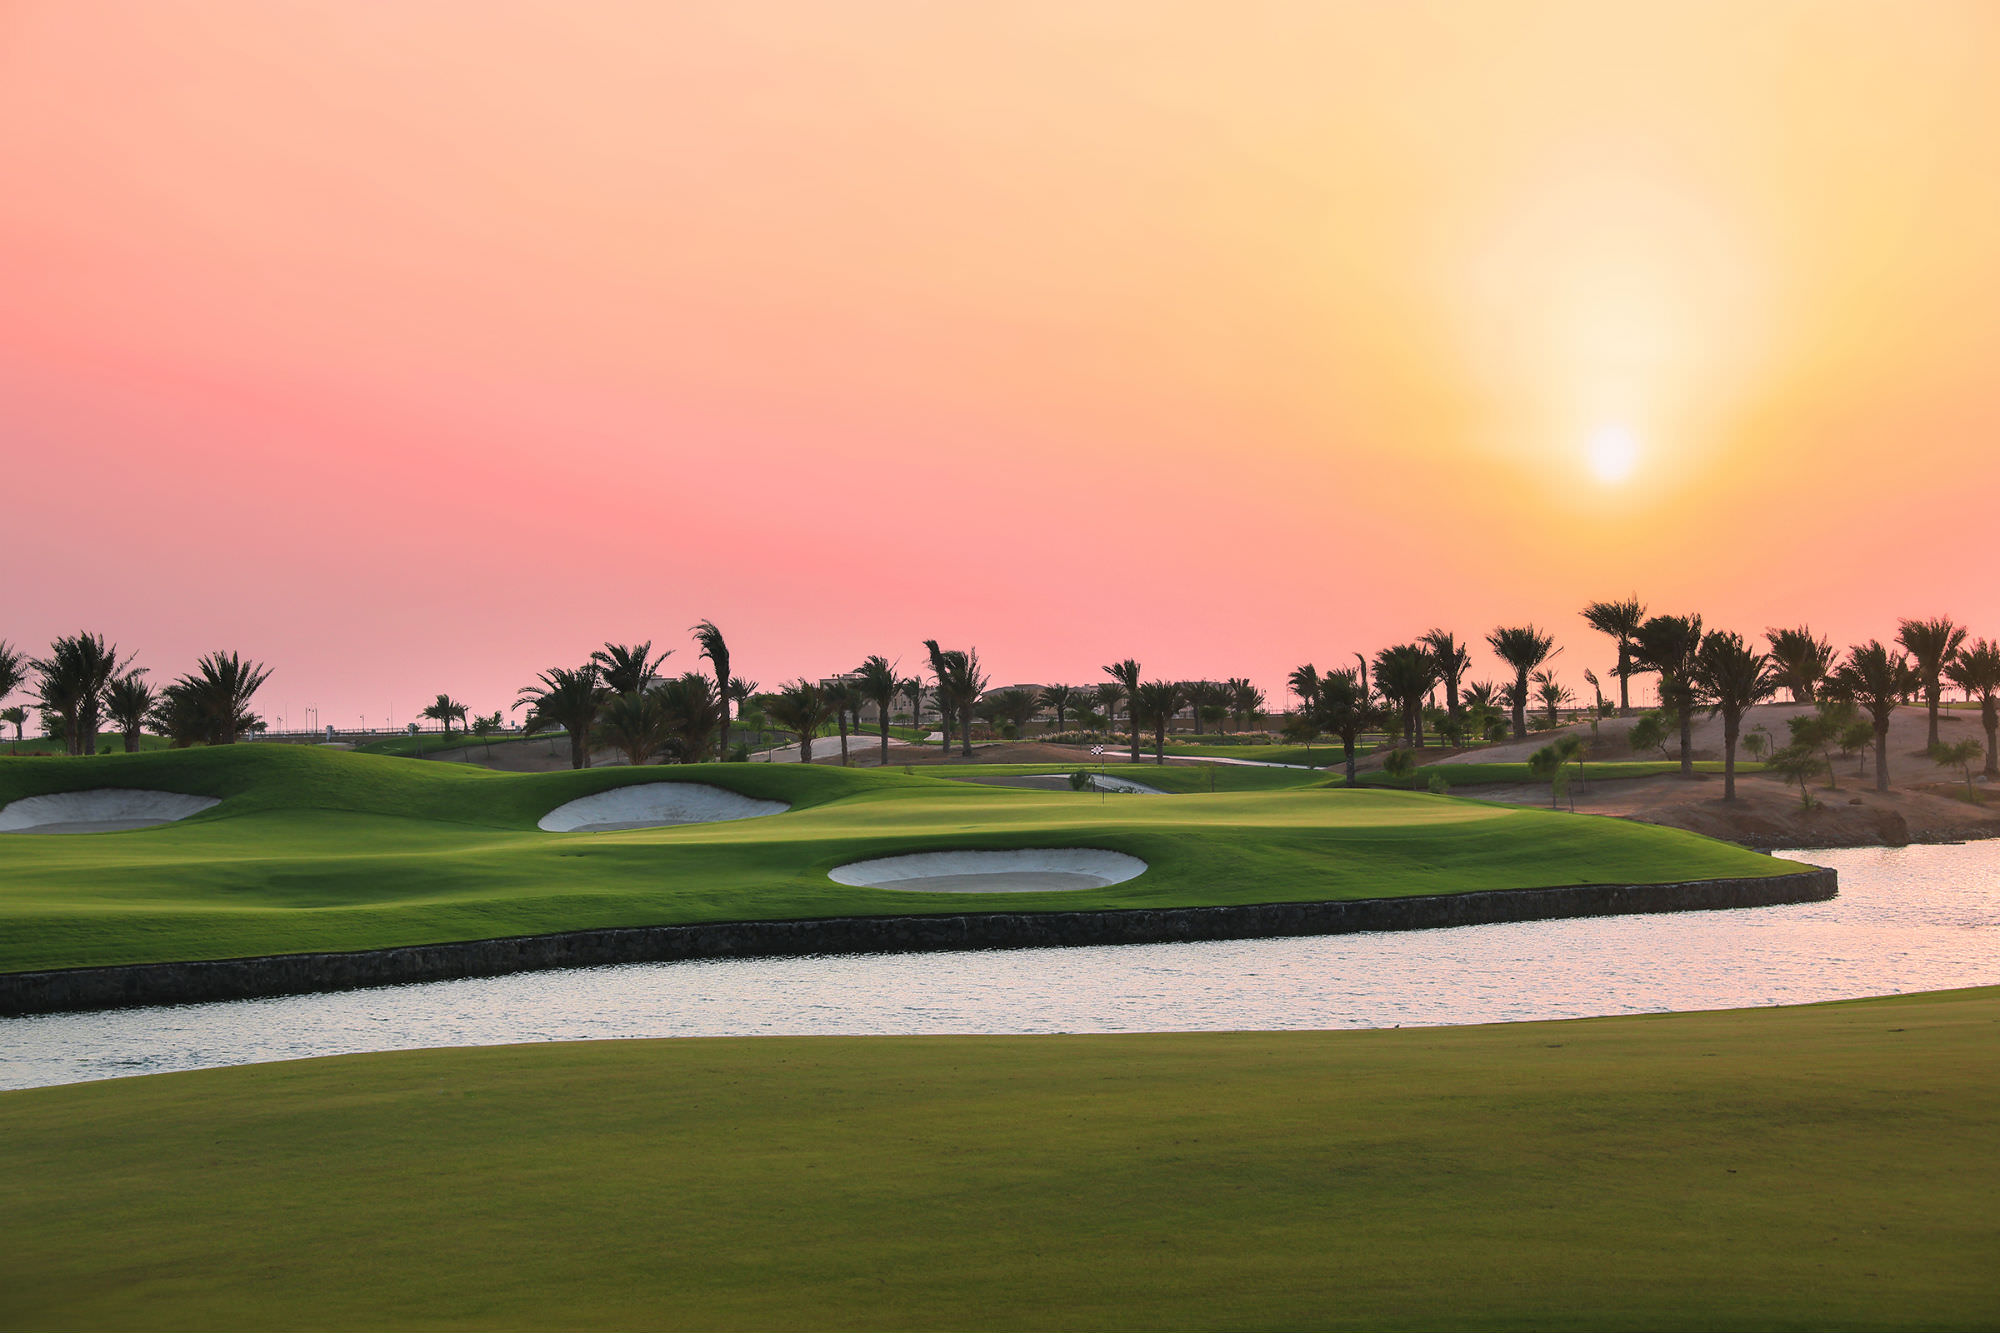 Royal Greens | National Club Golfer